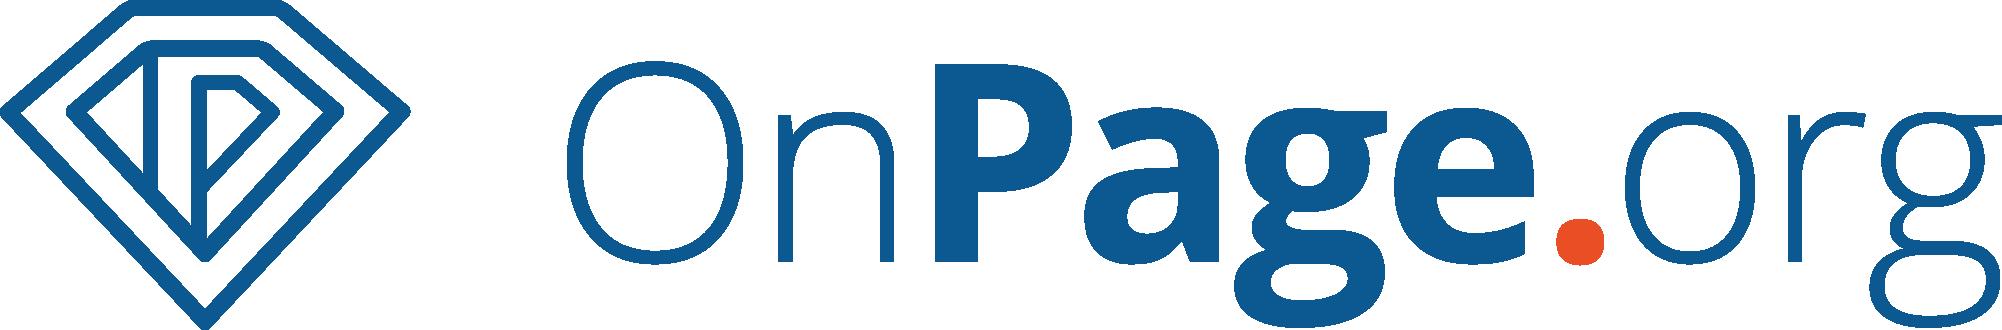 onpage_logo_blue